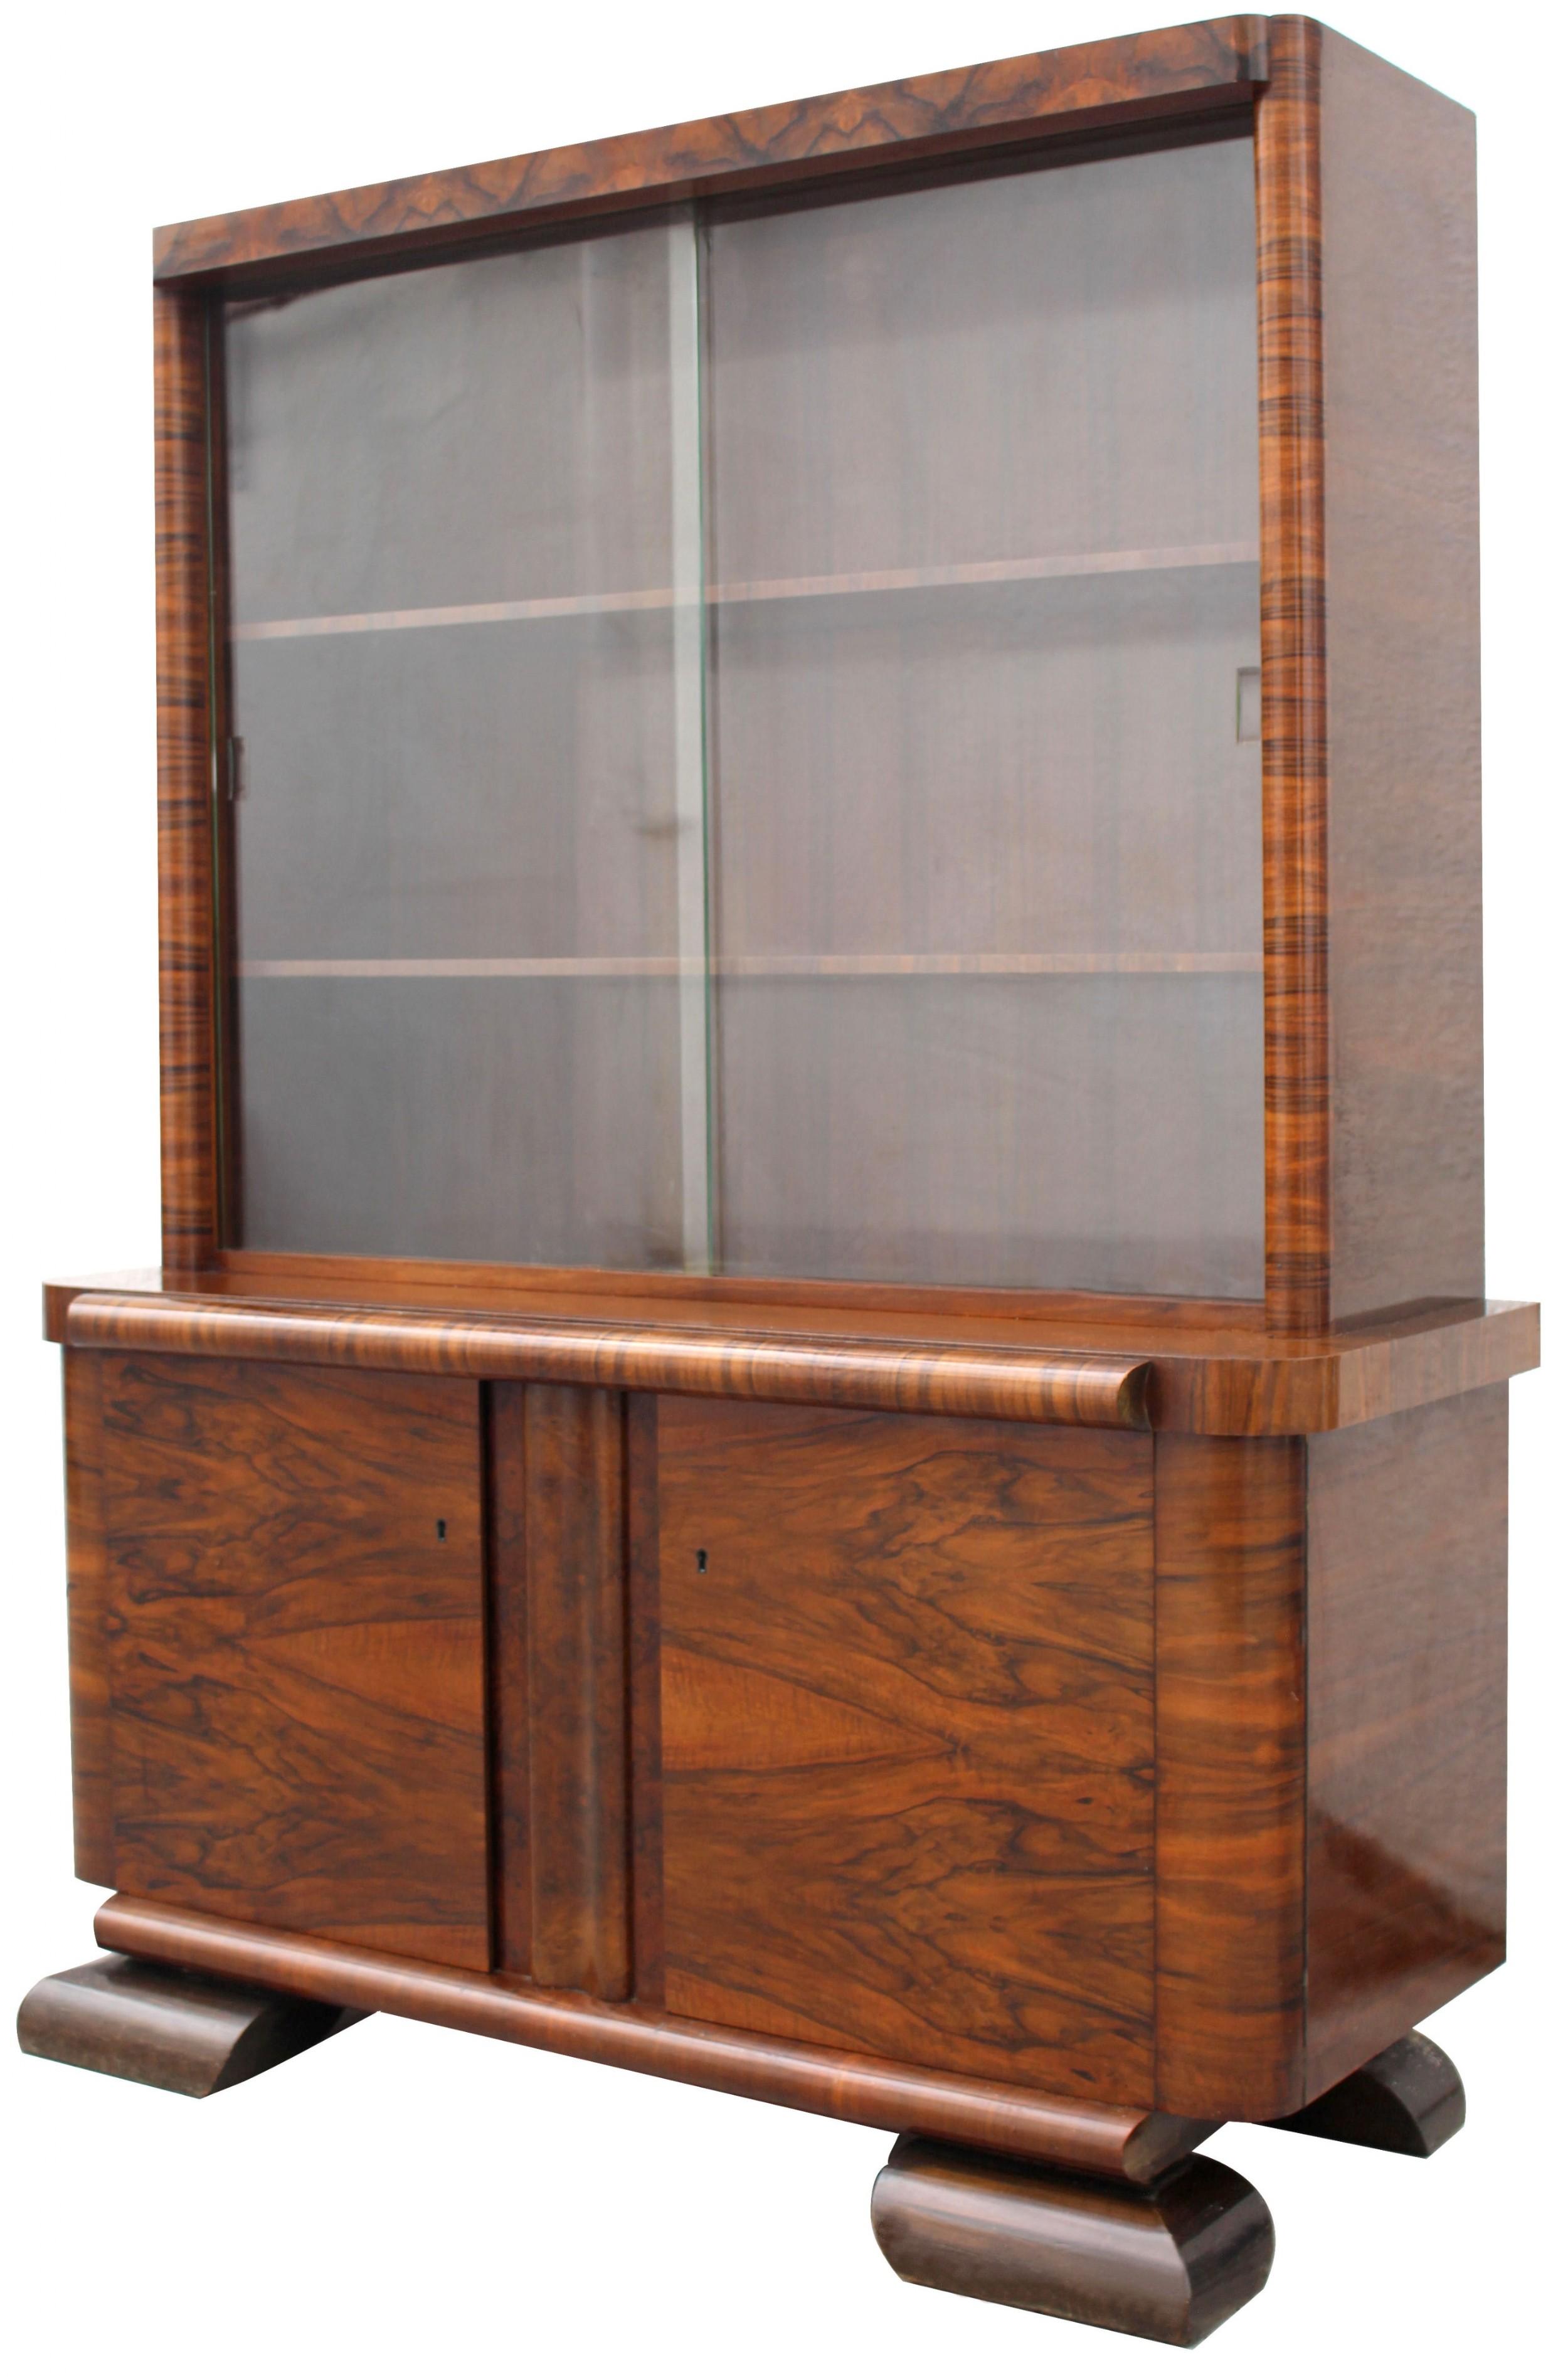 art deco figured walnut bookcase circa 1930